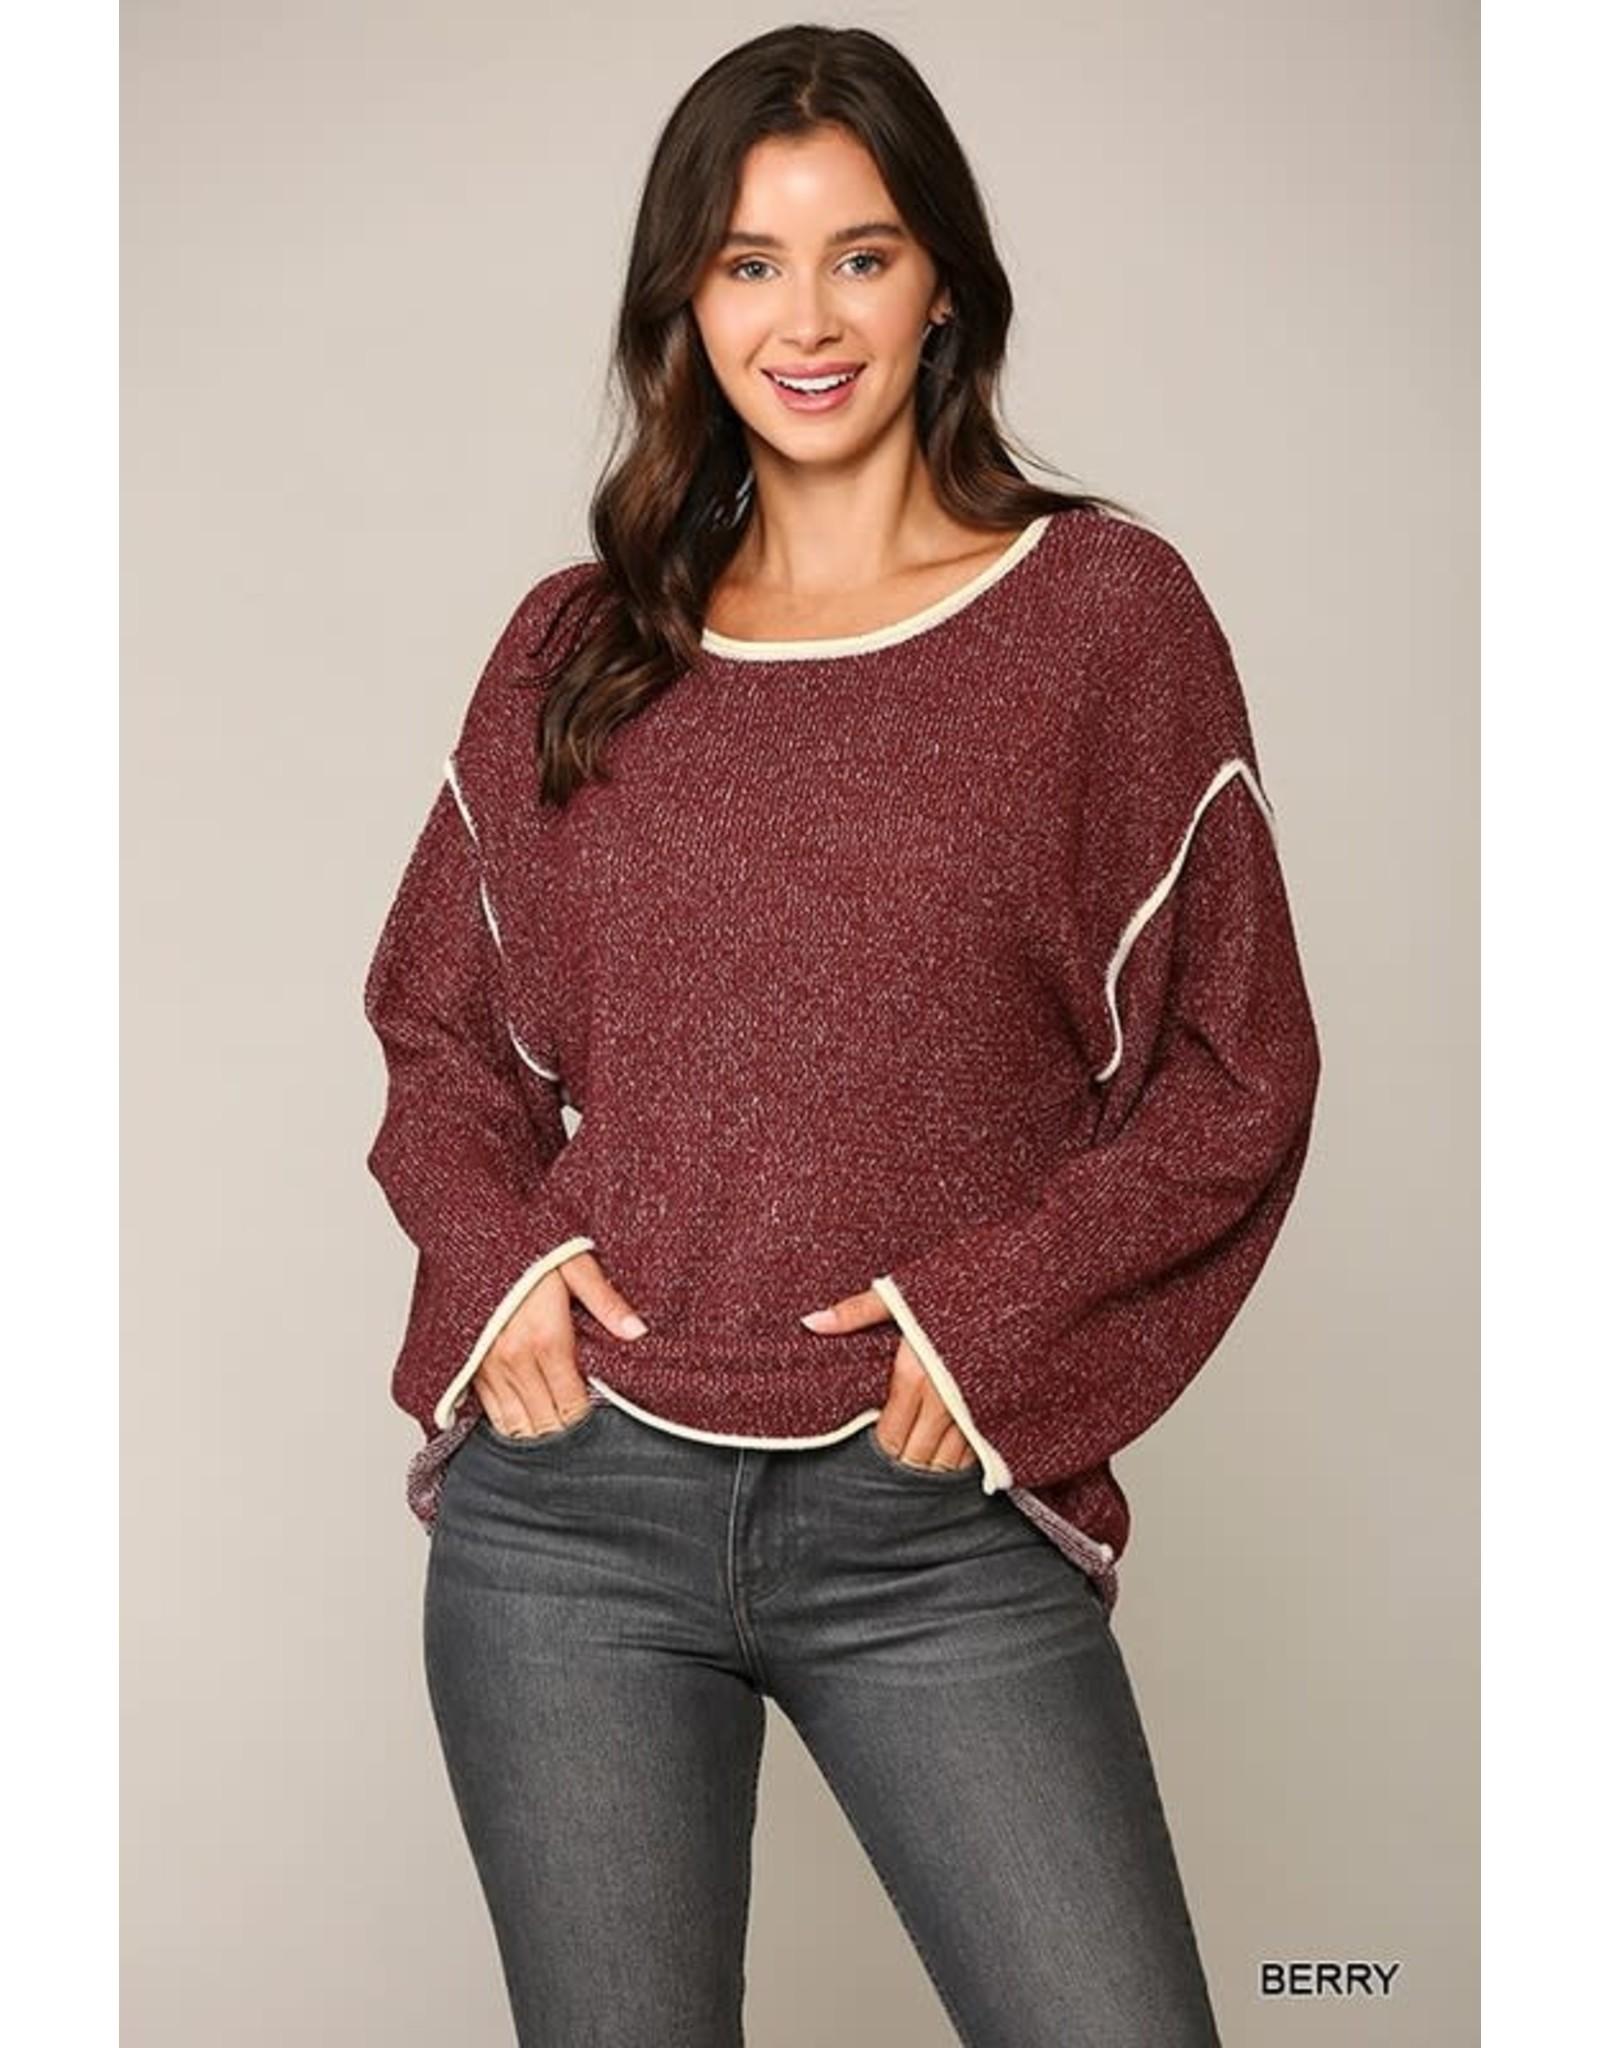 Harvest Season Sweater